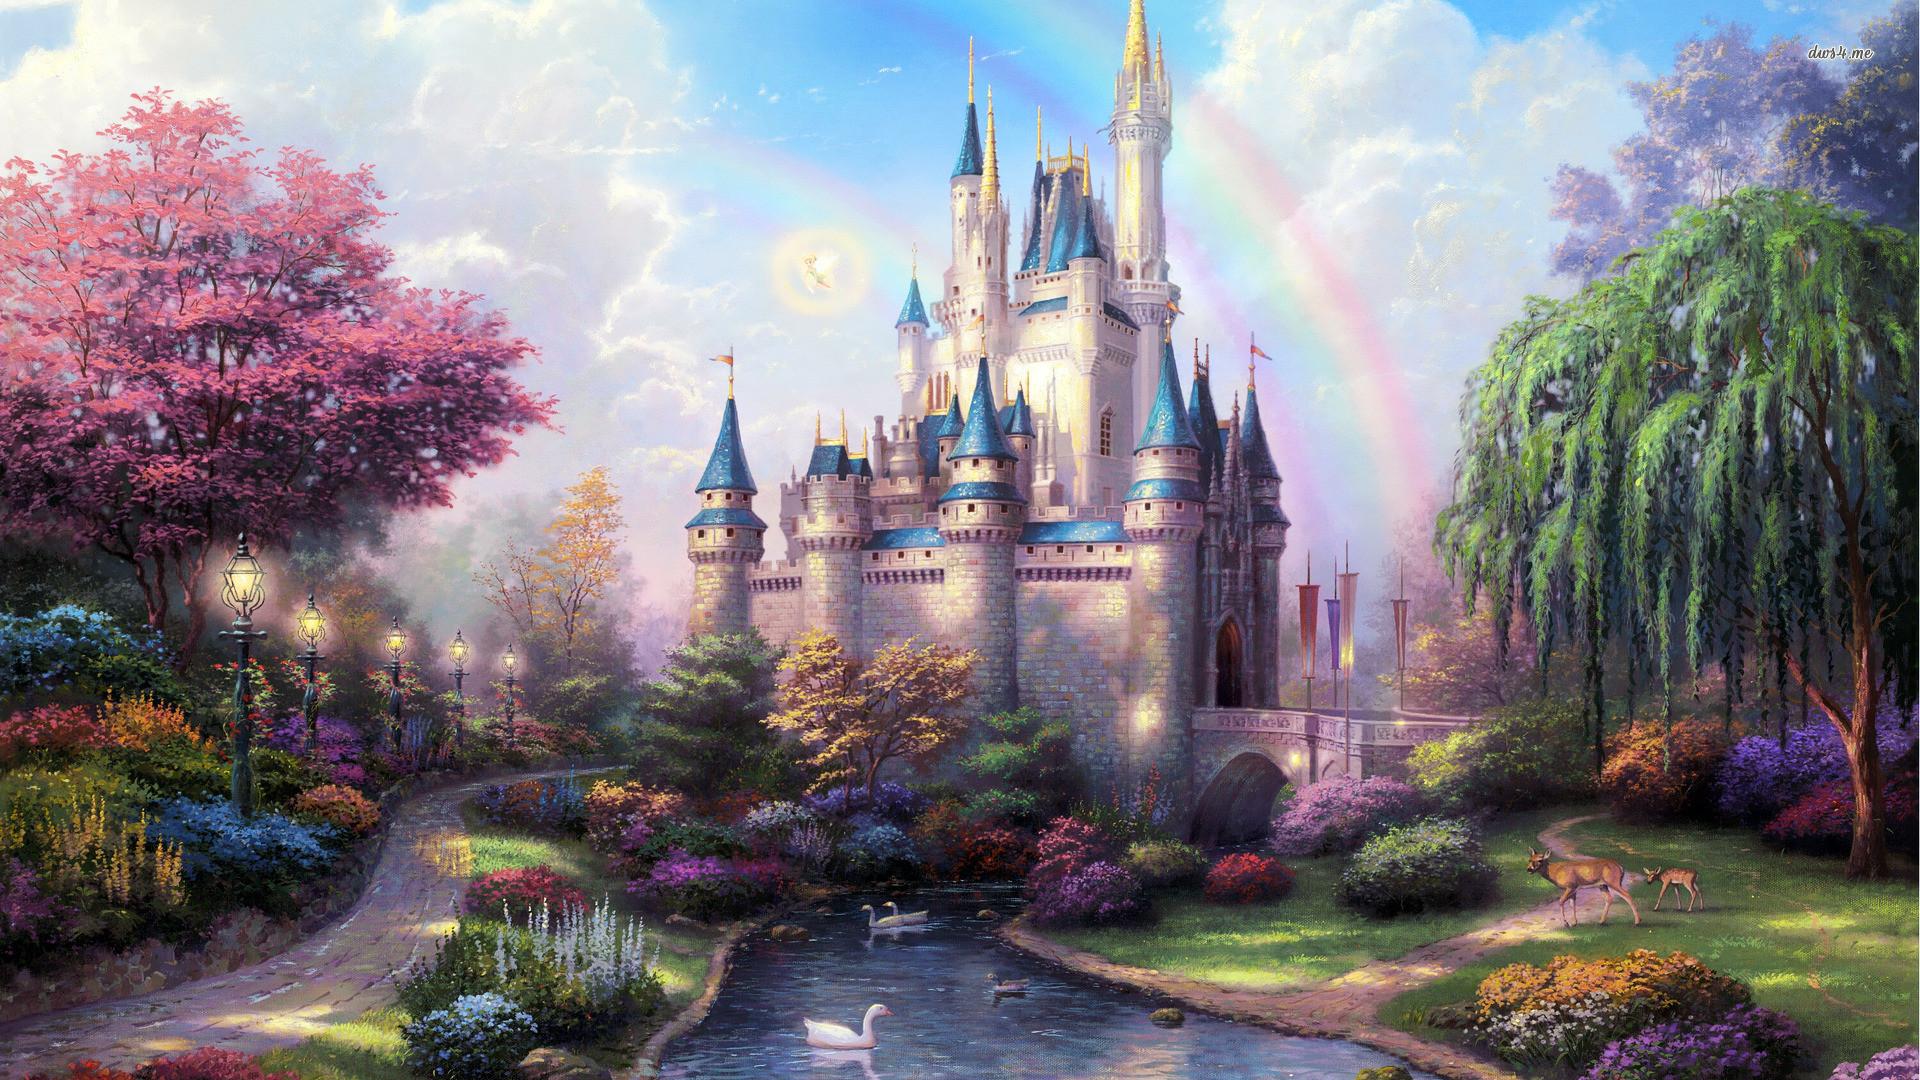 … castle wallpaper 5 …